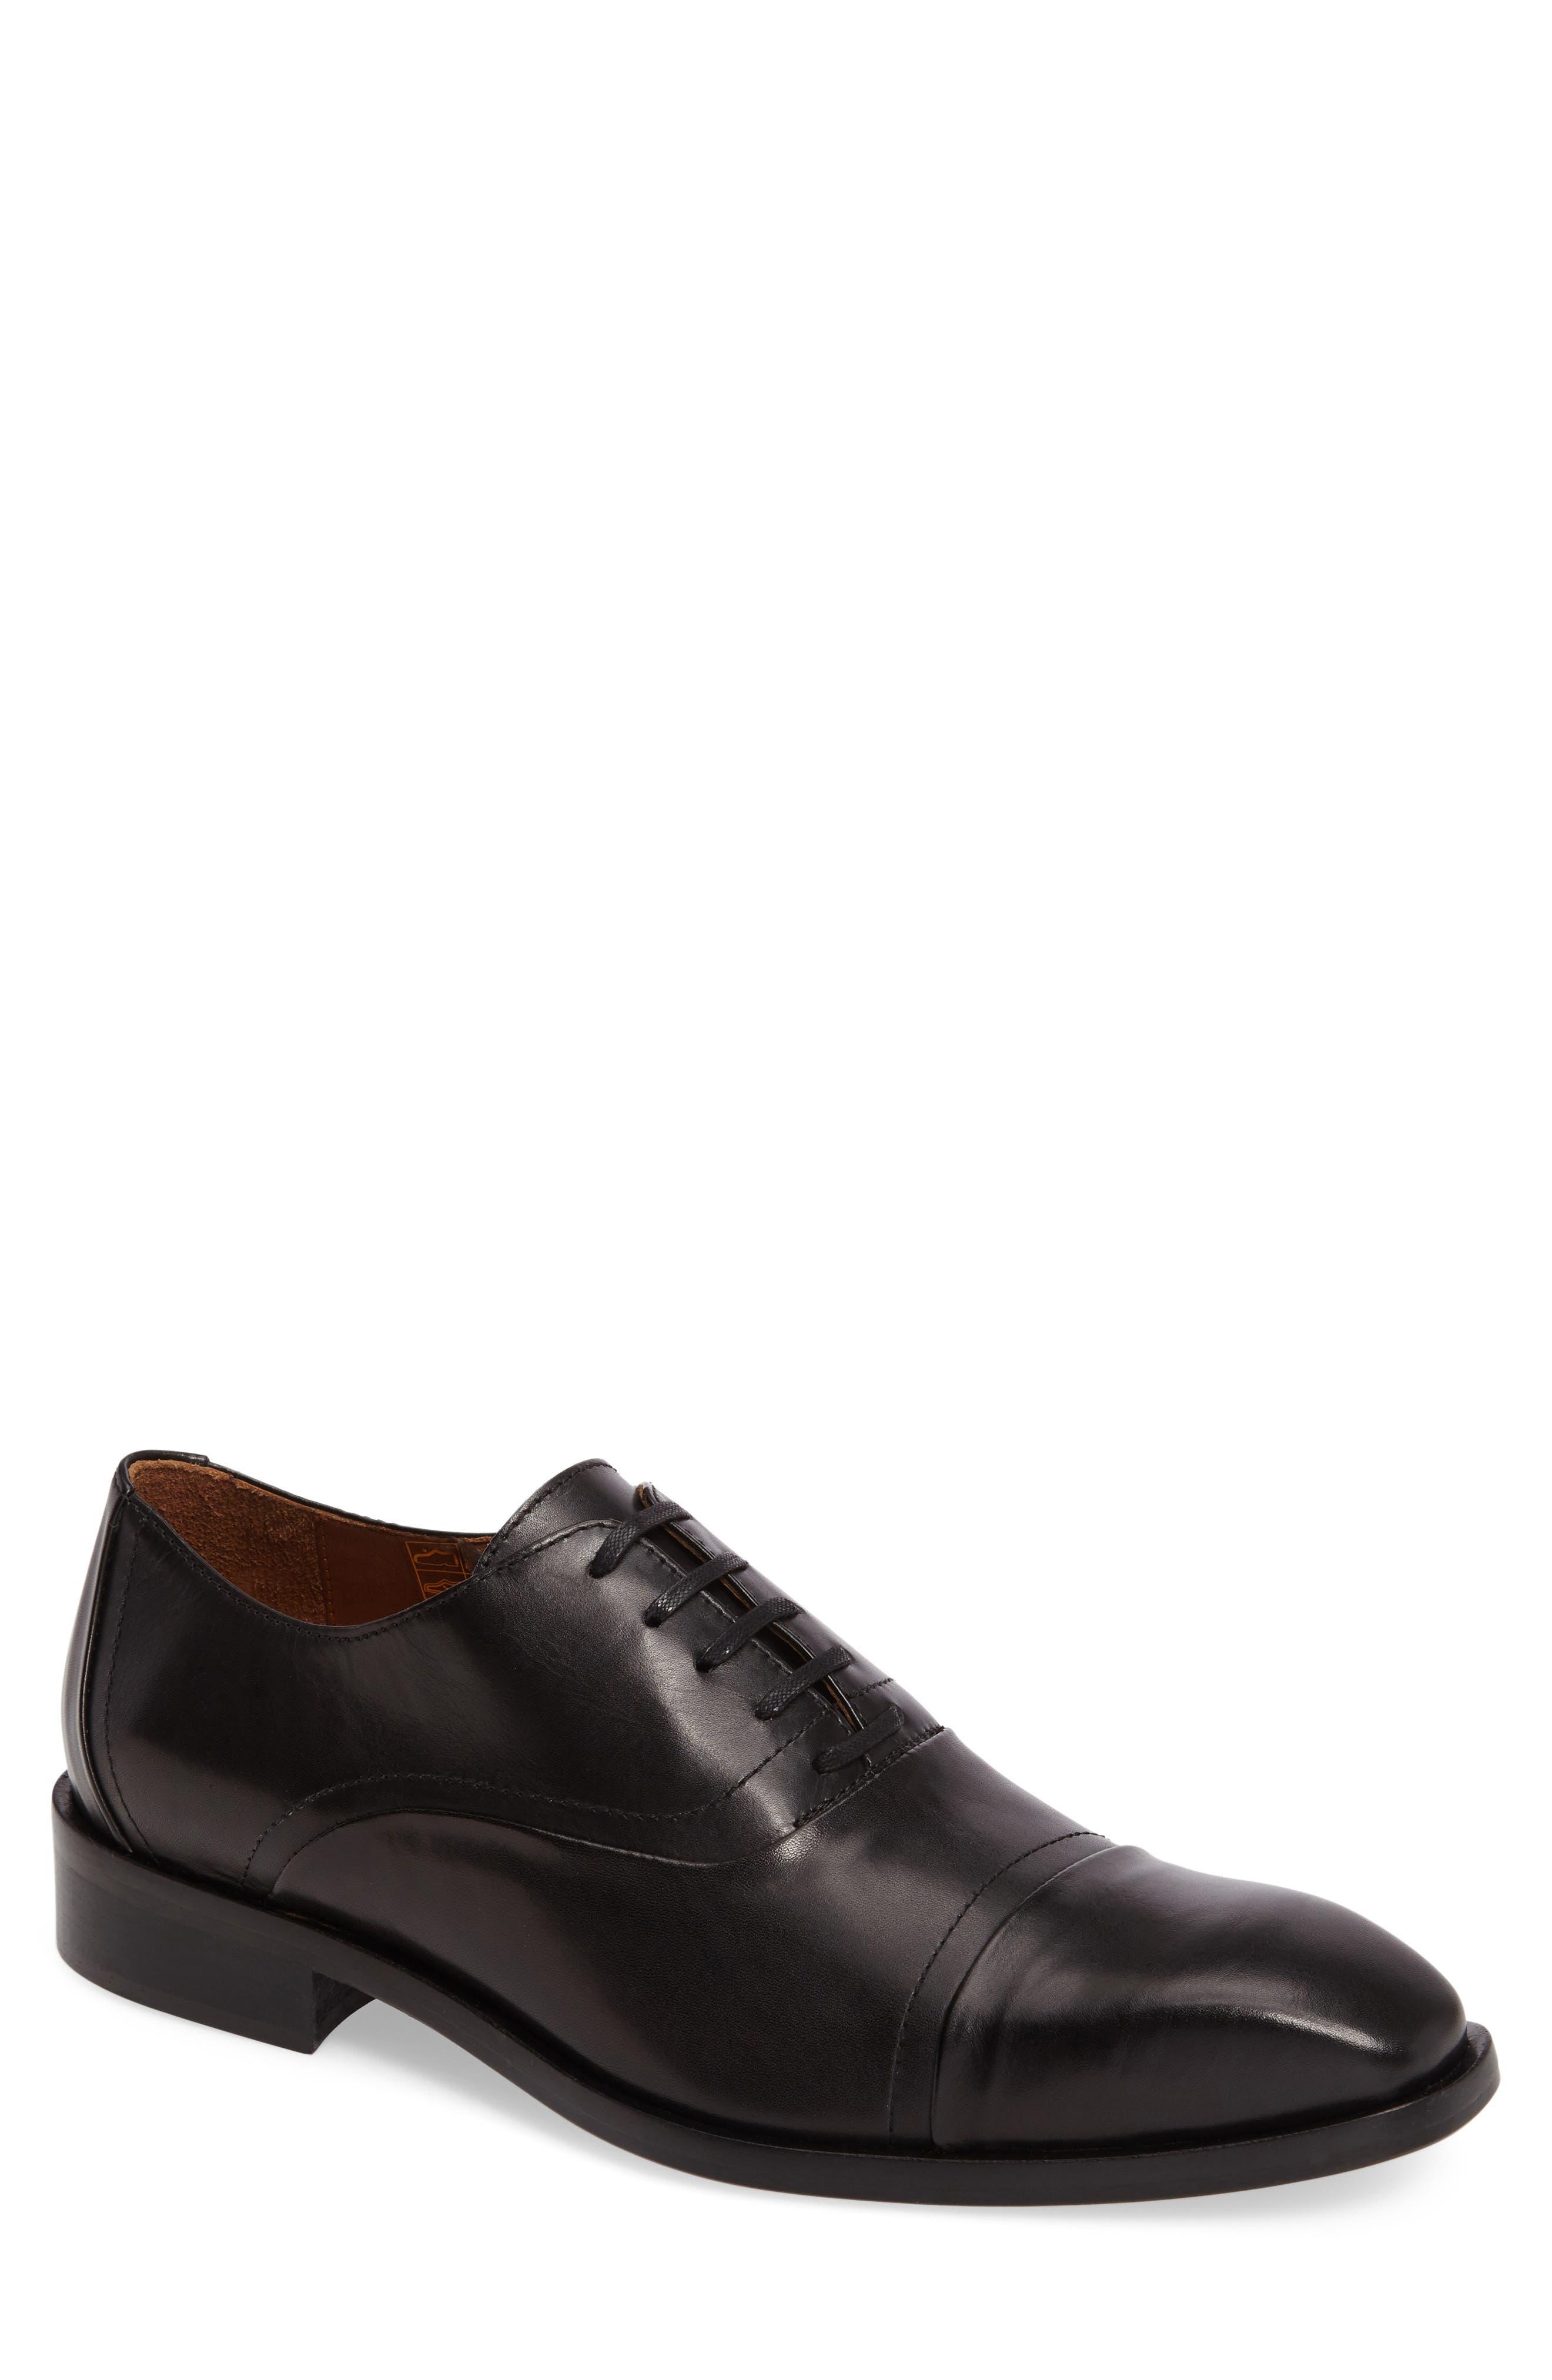 Valerico Cap Toe Oxford,                         Main,                         color, Black Leather